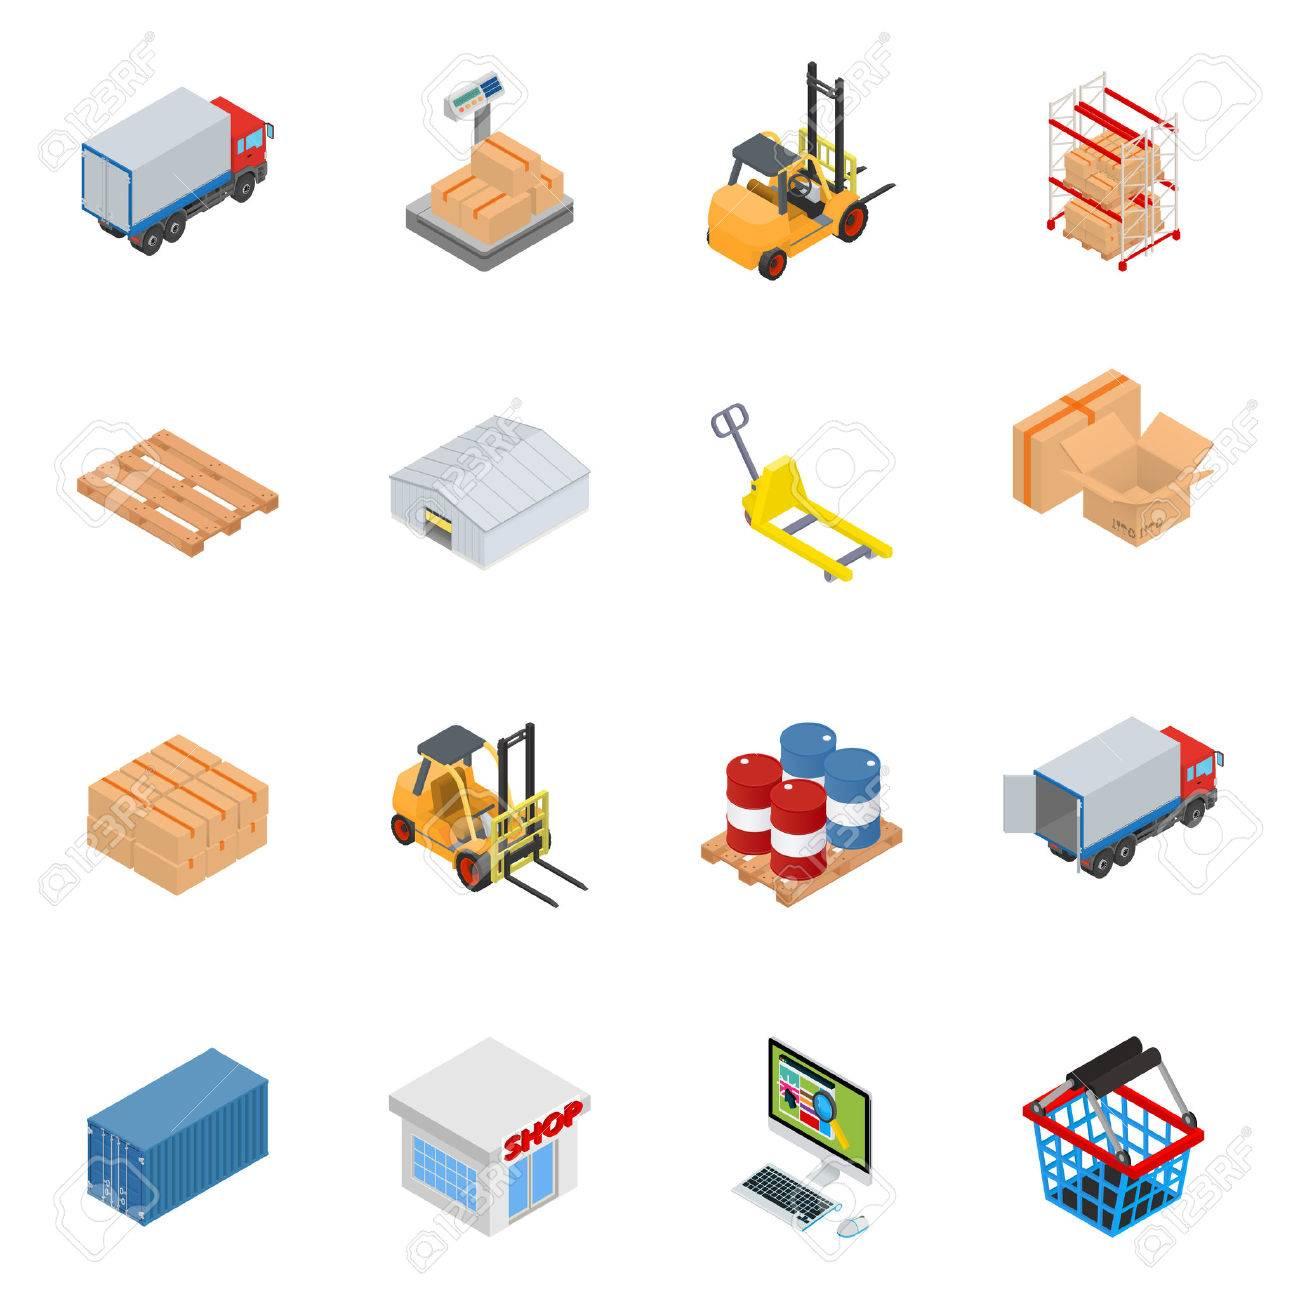 Vector warehouse equipment icon set - 51001692